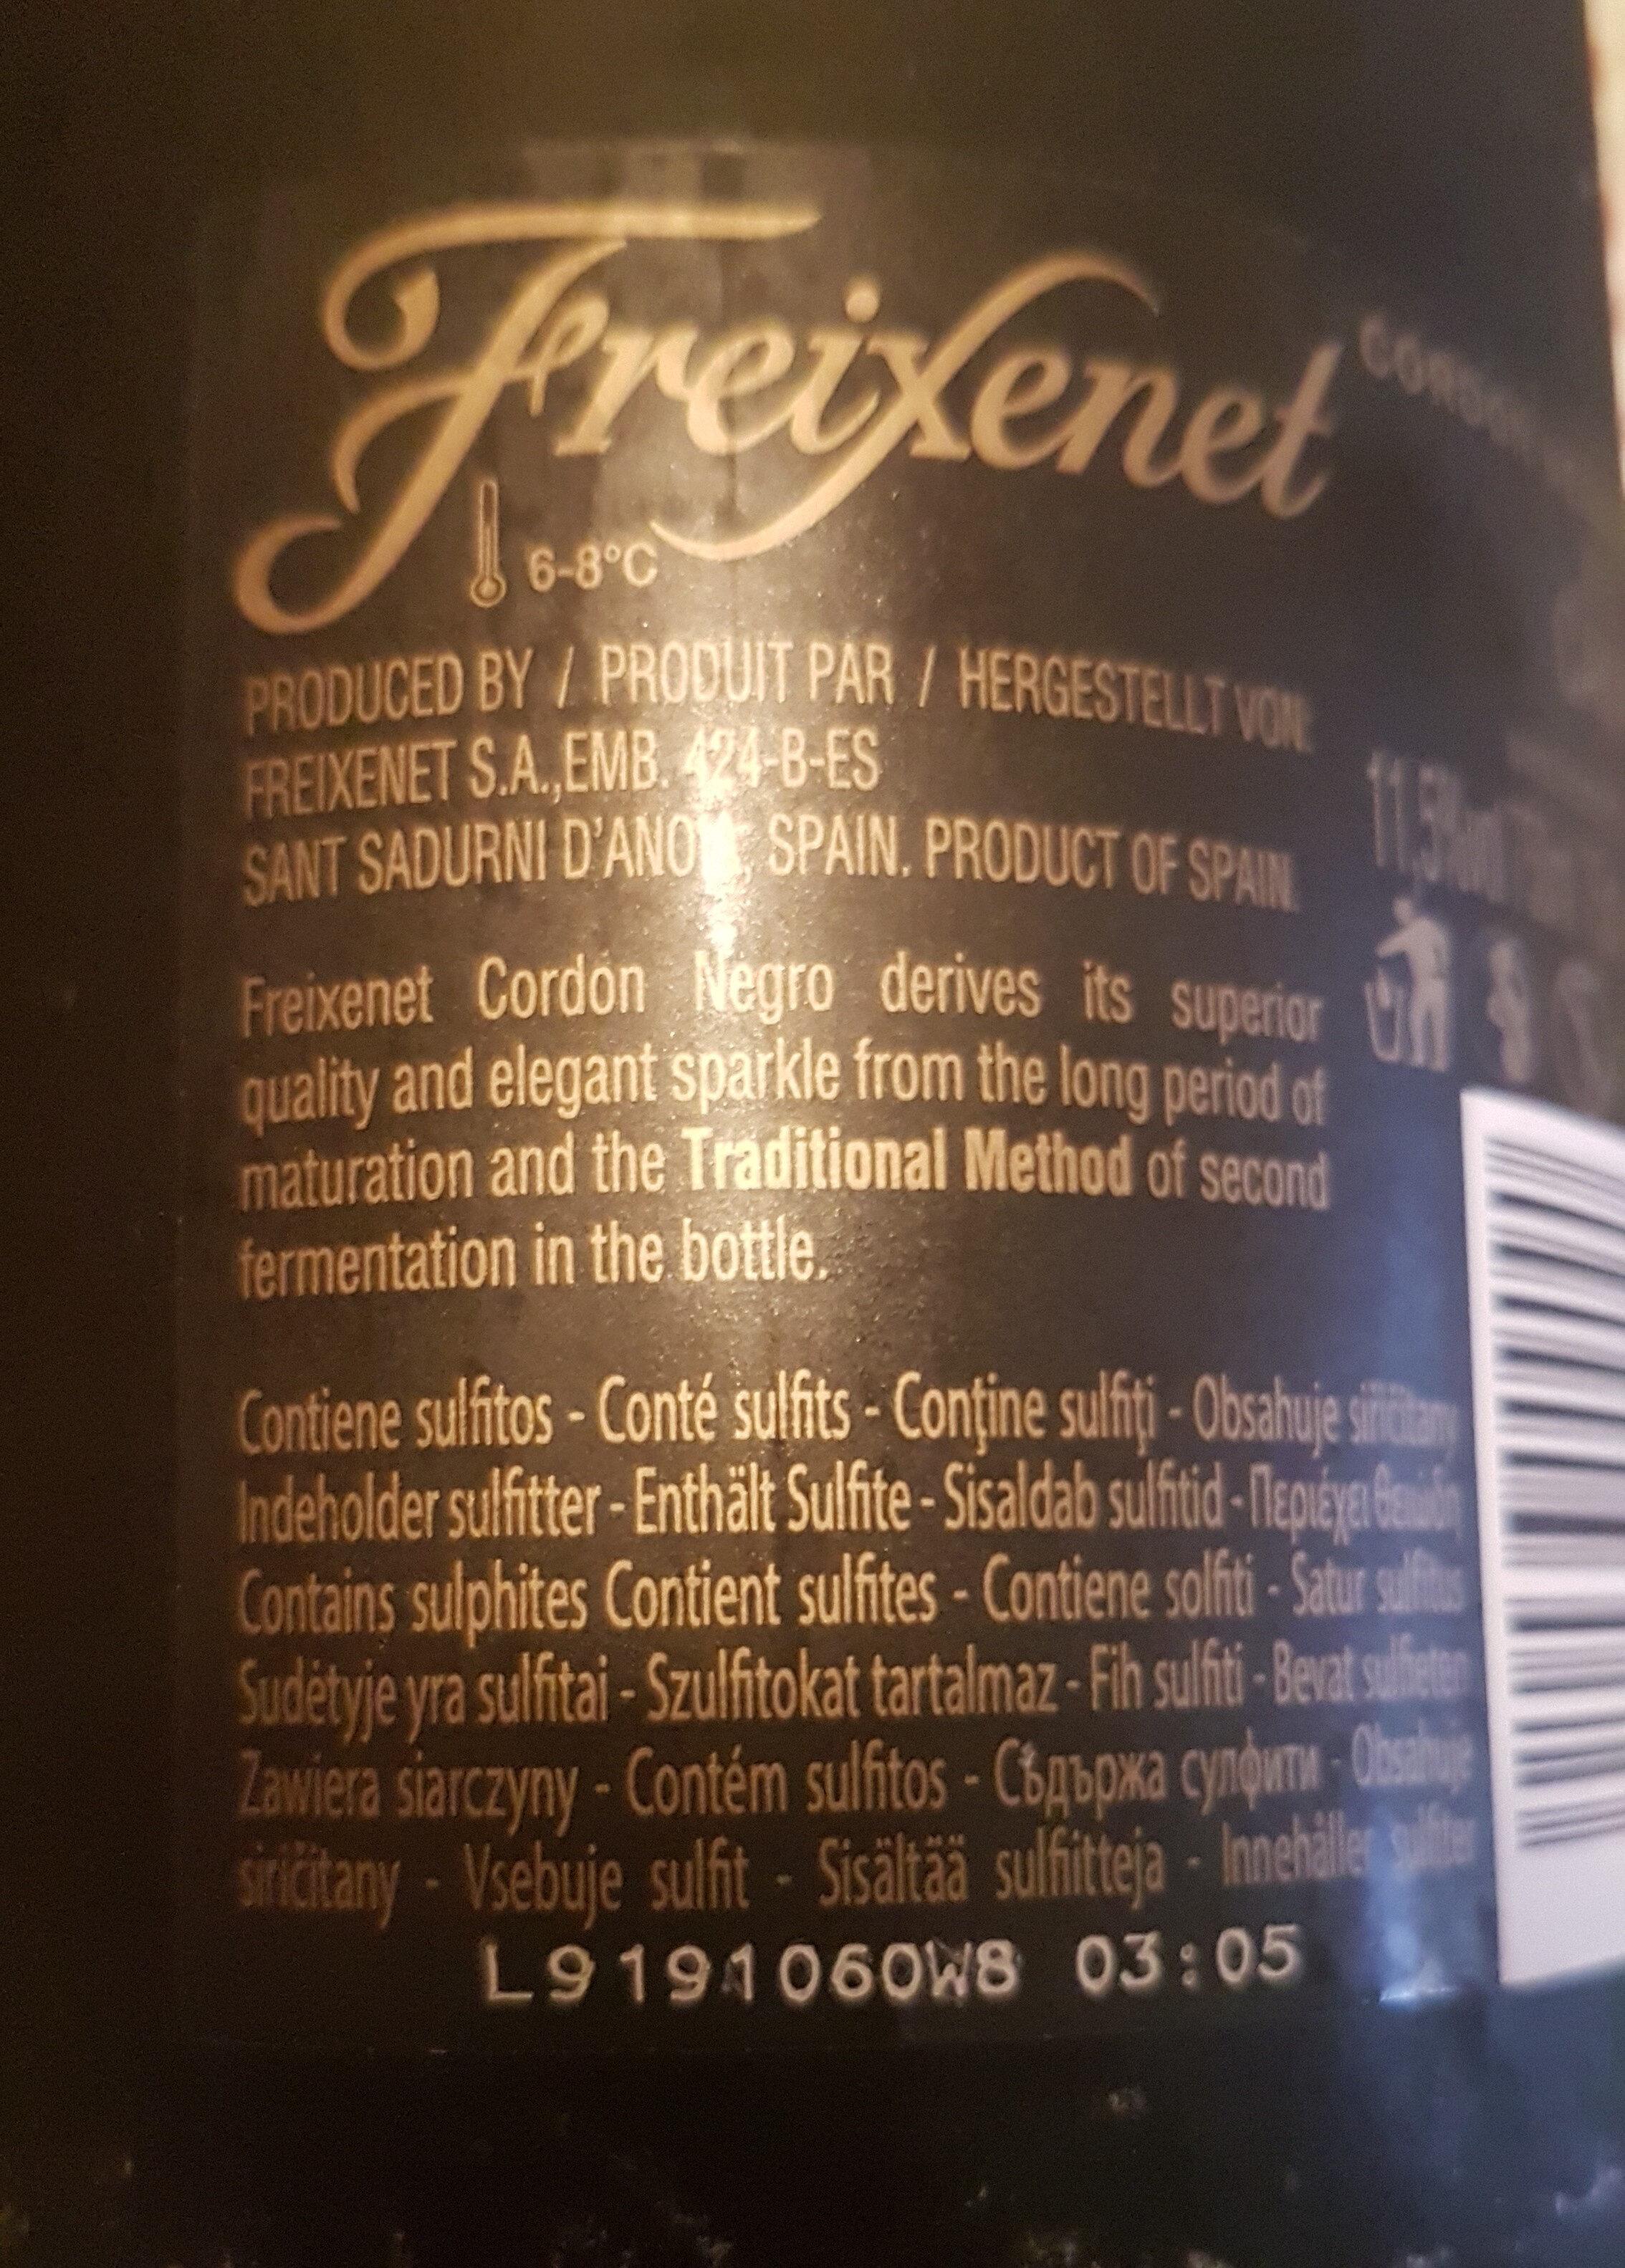 Asda Extra Special Maple Cured Smoked Bacon Quiche Lorraine - Ingrediënten - fr